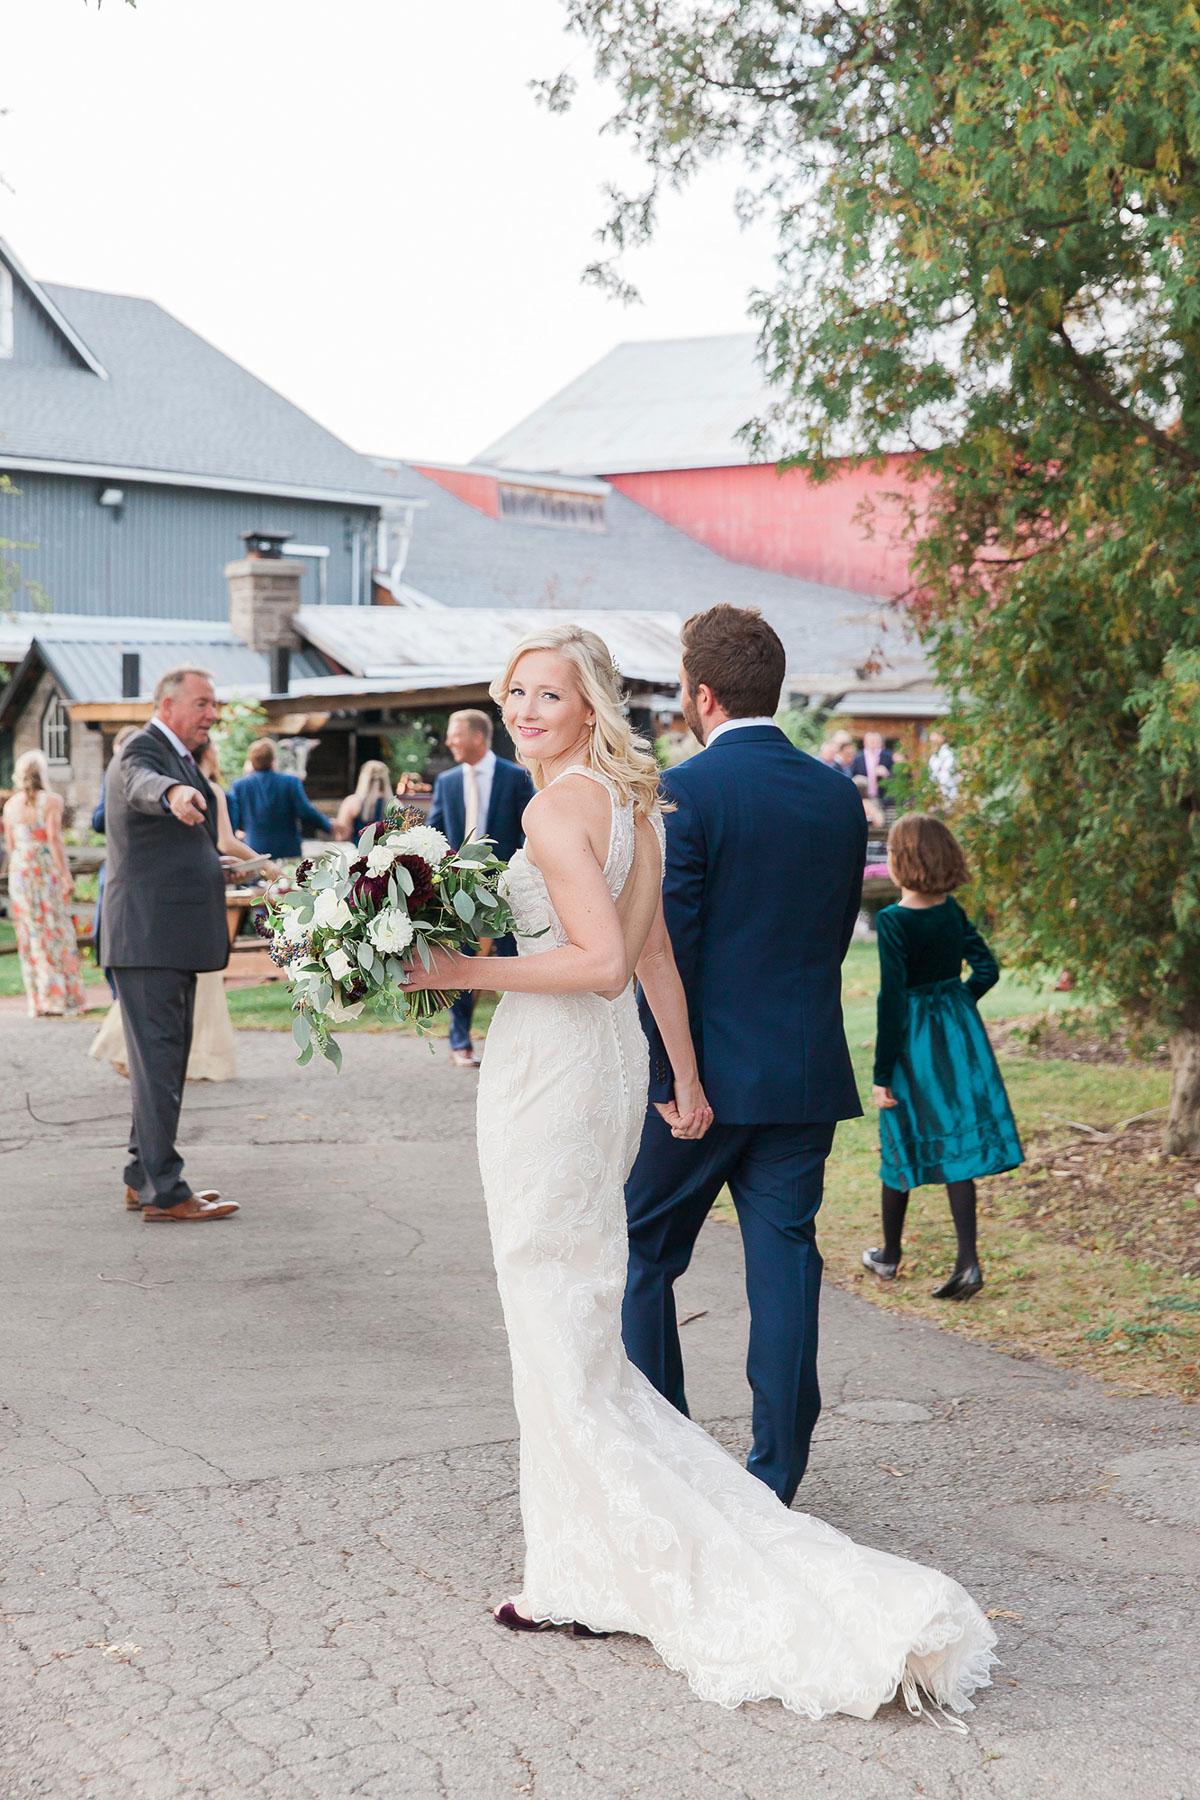 gemini-photography-vineyard-bride-swish-list-honsberger-estates-jordan-wedding-29.jpg